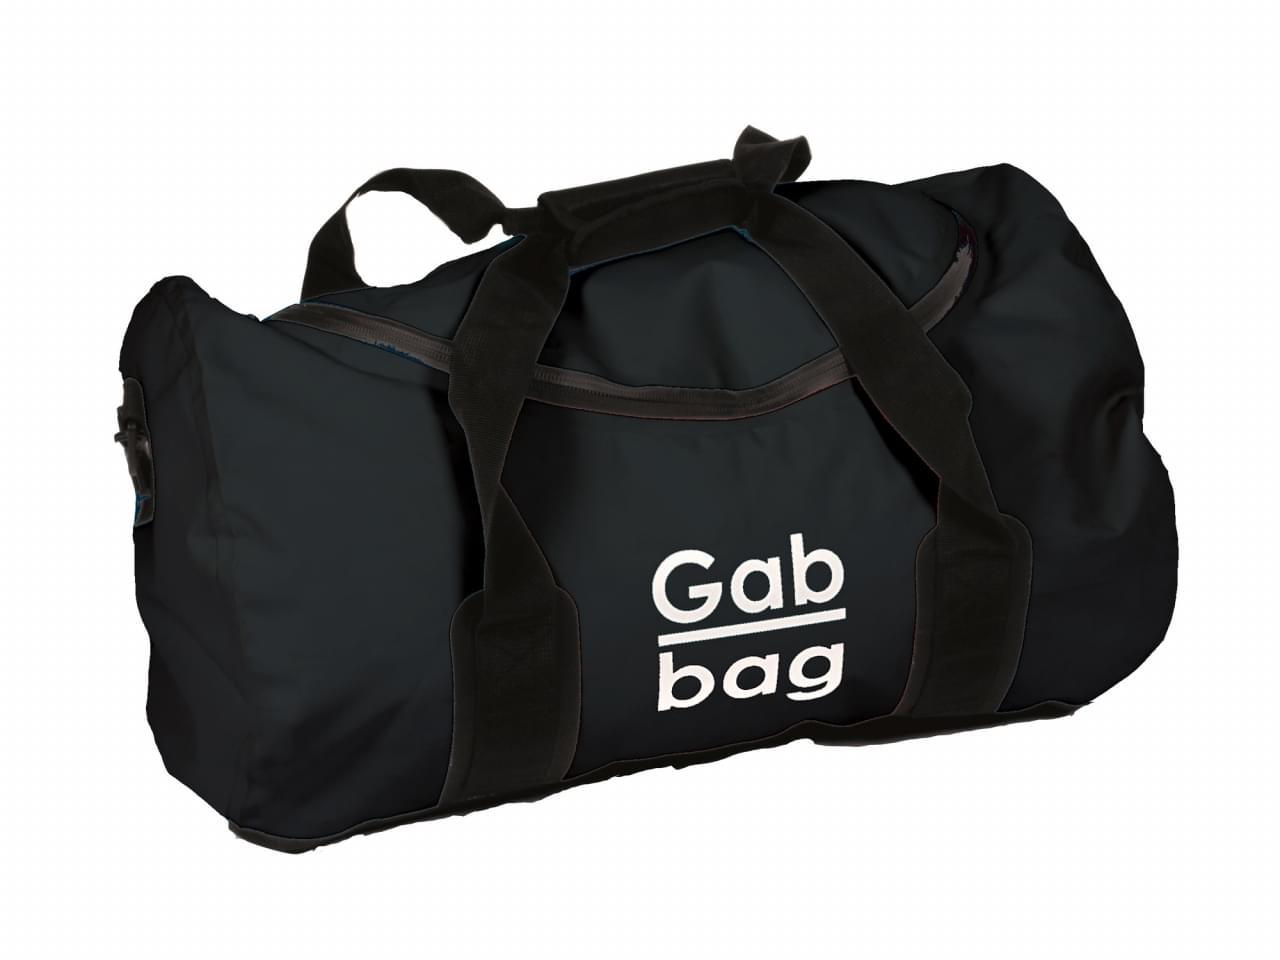 Gabbag Duffel Bag 65L